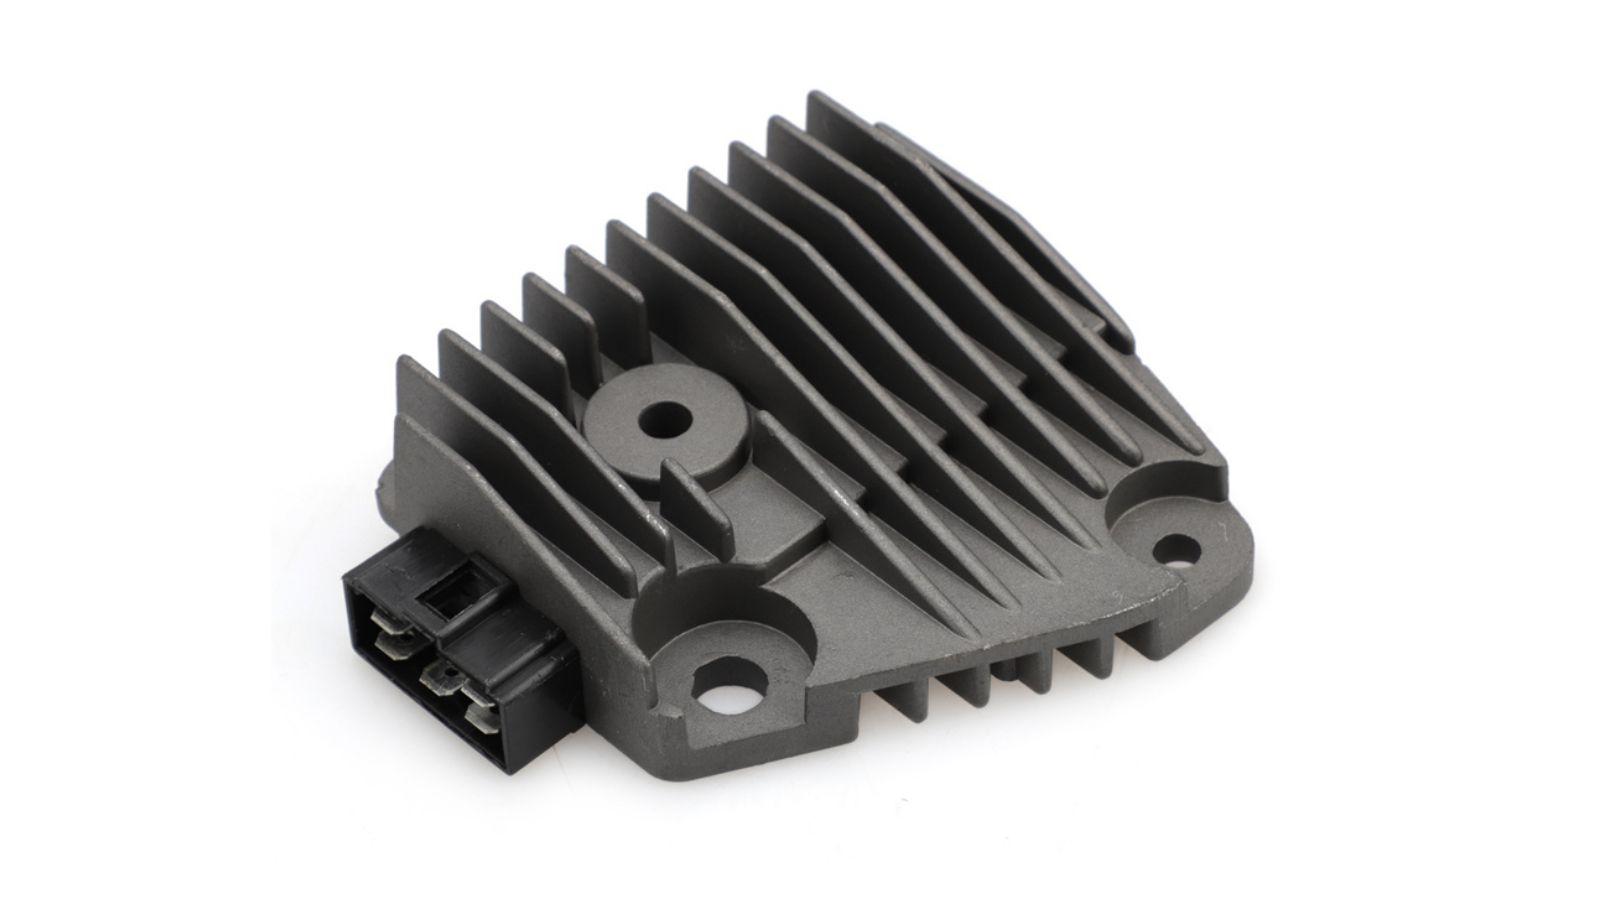 12V Motorcycle Voltage Regulator Stabilizer Rectifier 5 Pin Plug